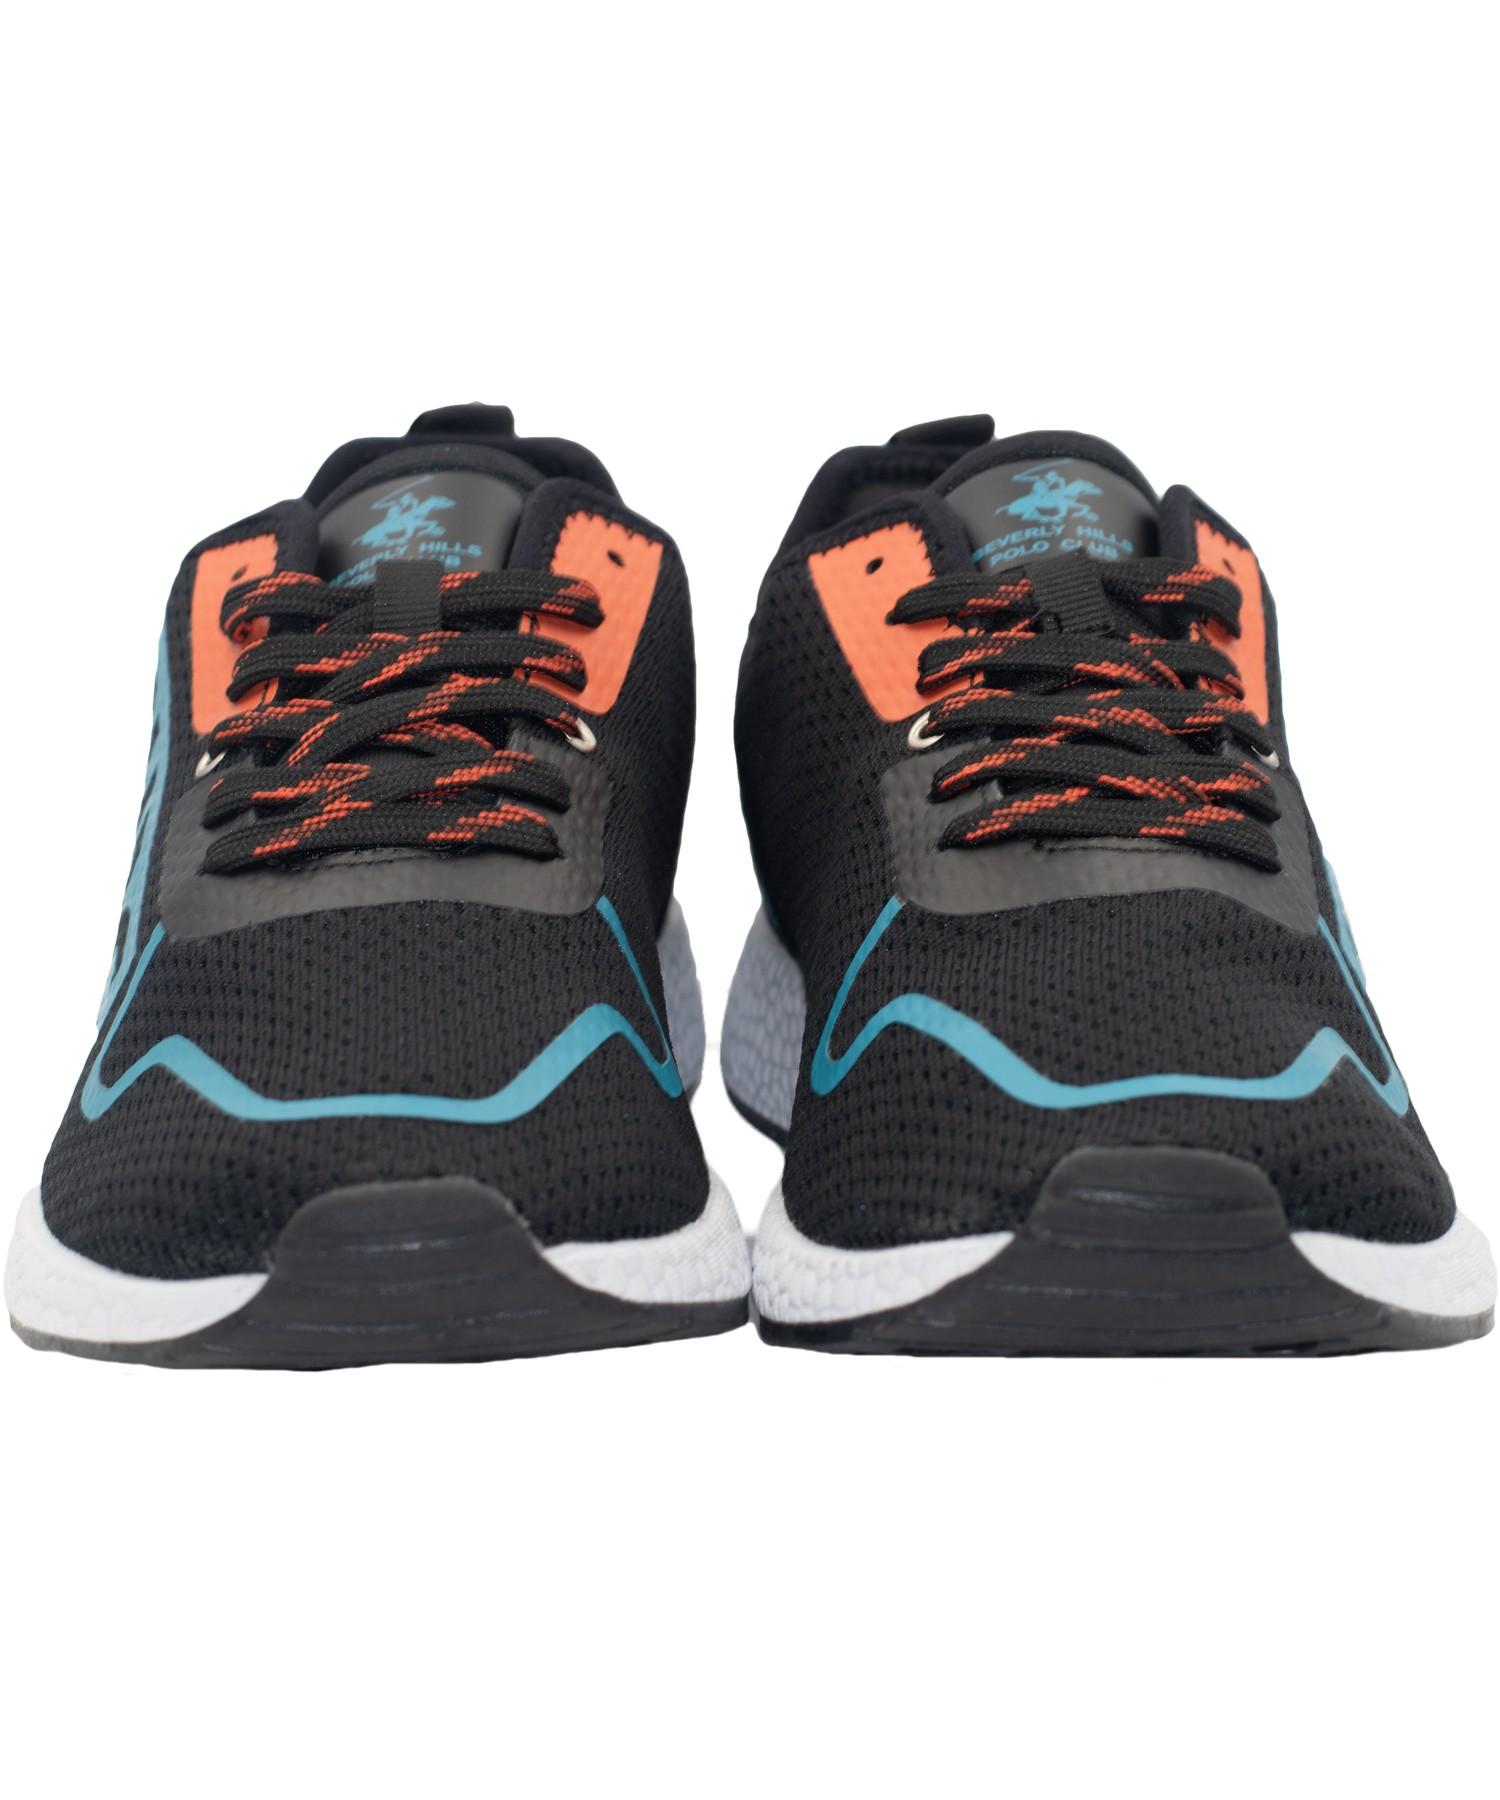 Zapatillas de Hombre Bhpc Purex  Negro-Celeste